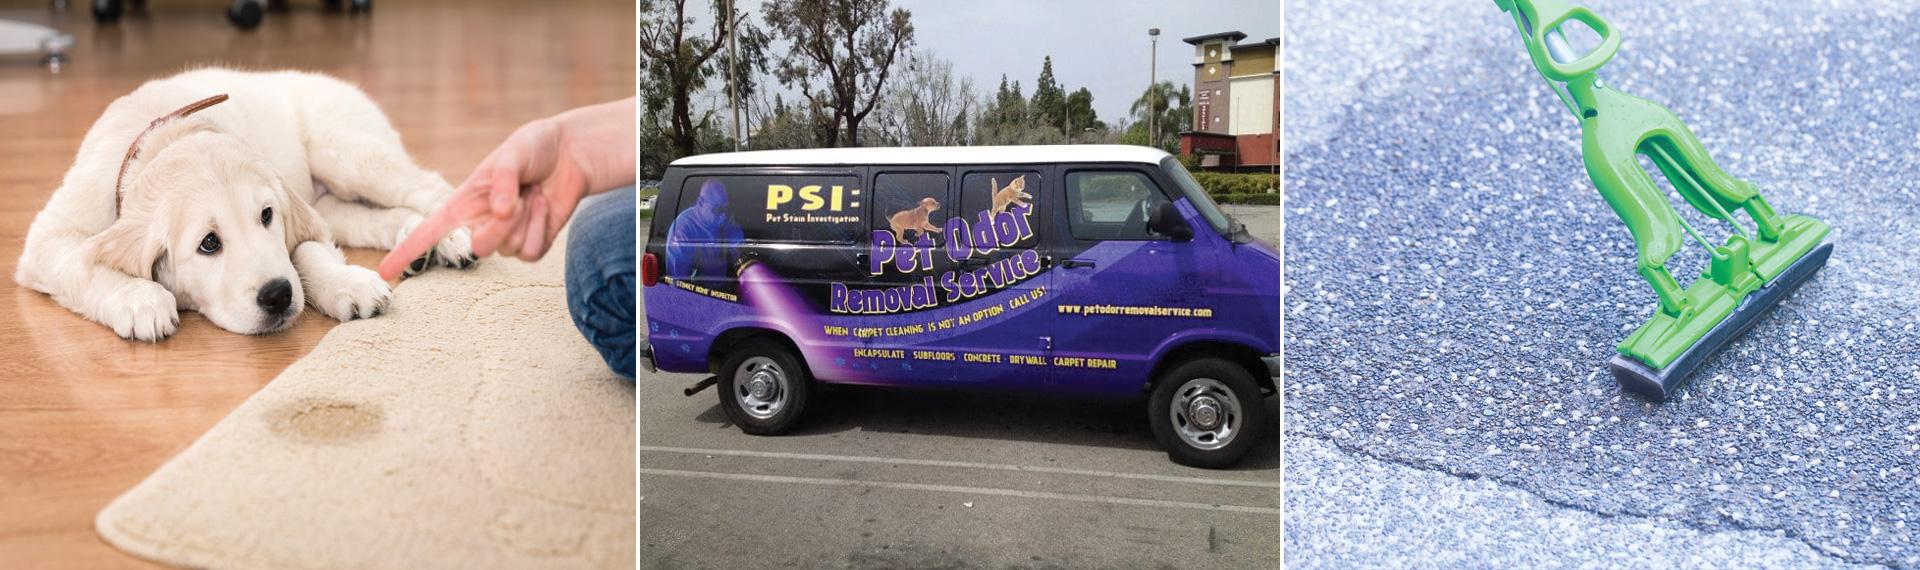 Pet Odor Removal Service Irvine CA